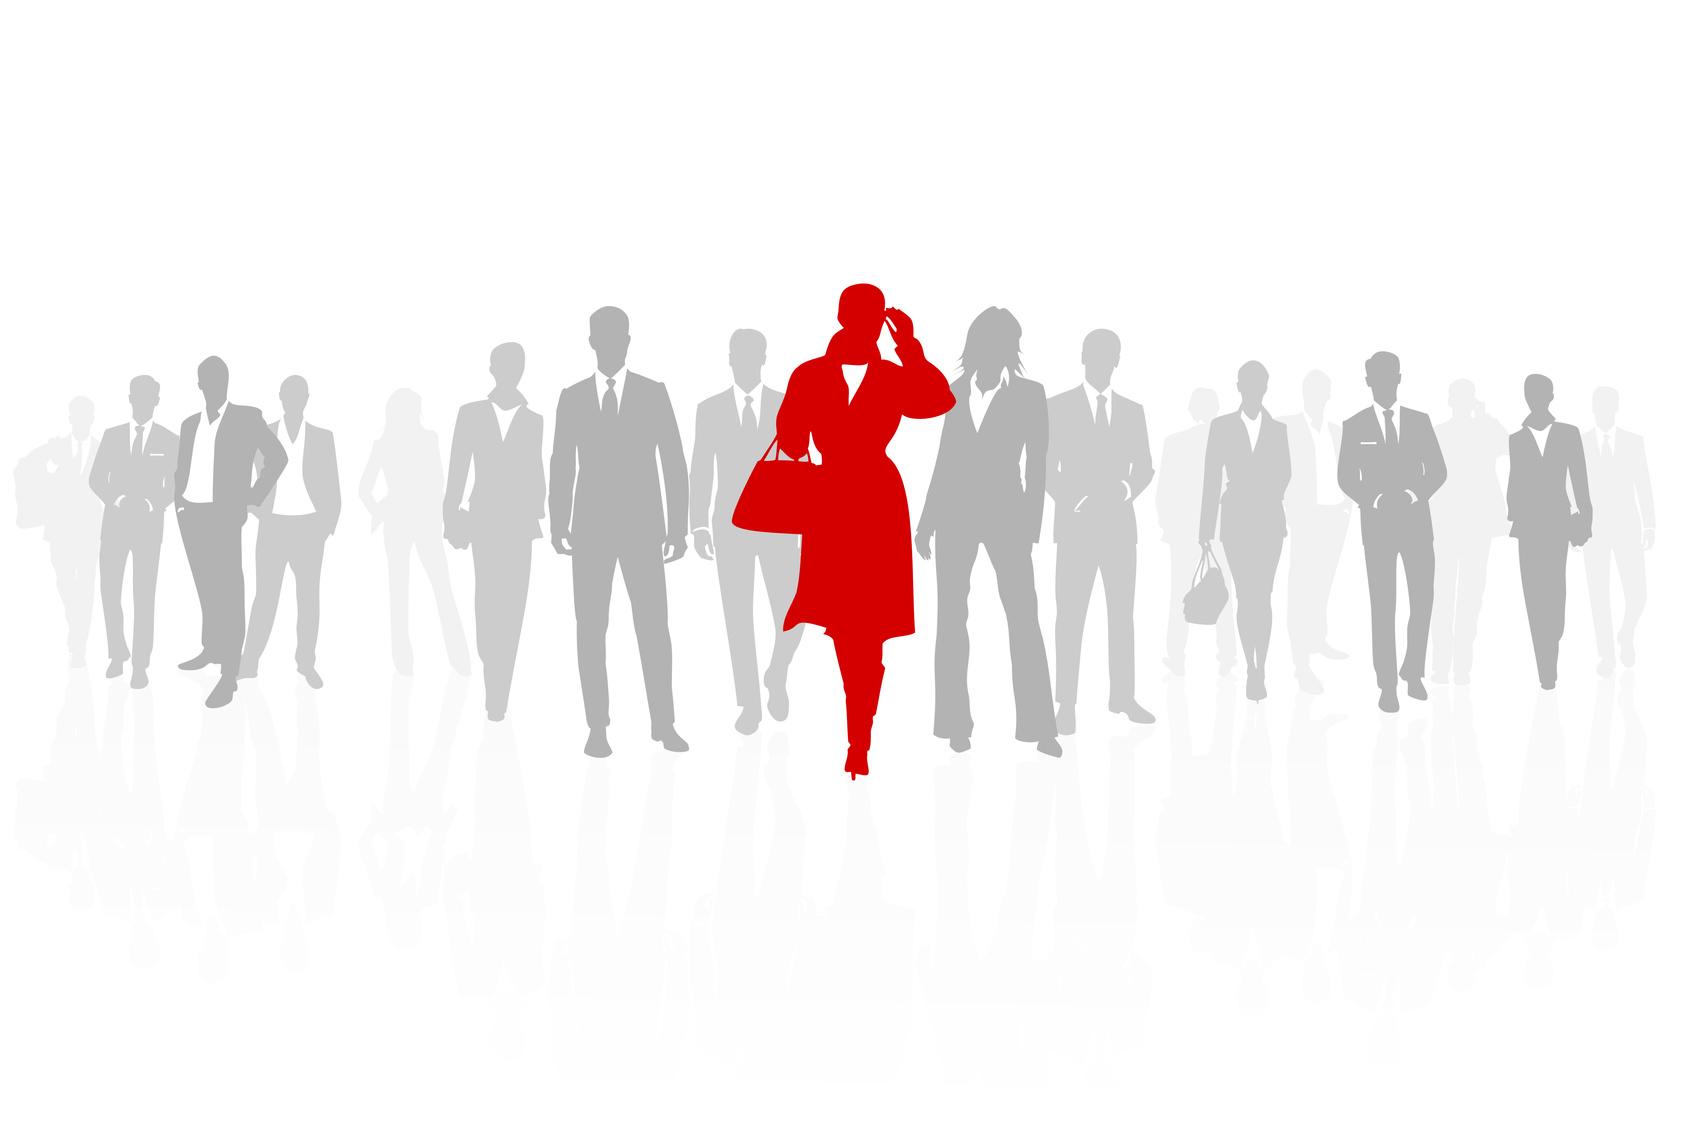 Best 45 Women in Leadership Backgrounds on HipWallpaper 1688x1125